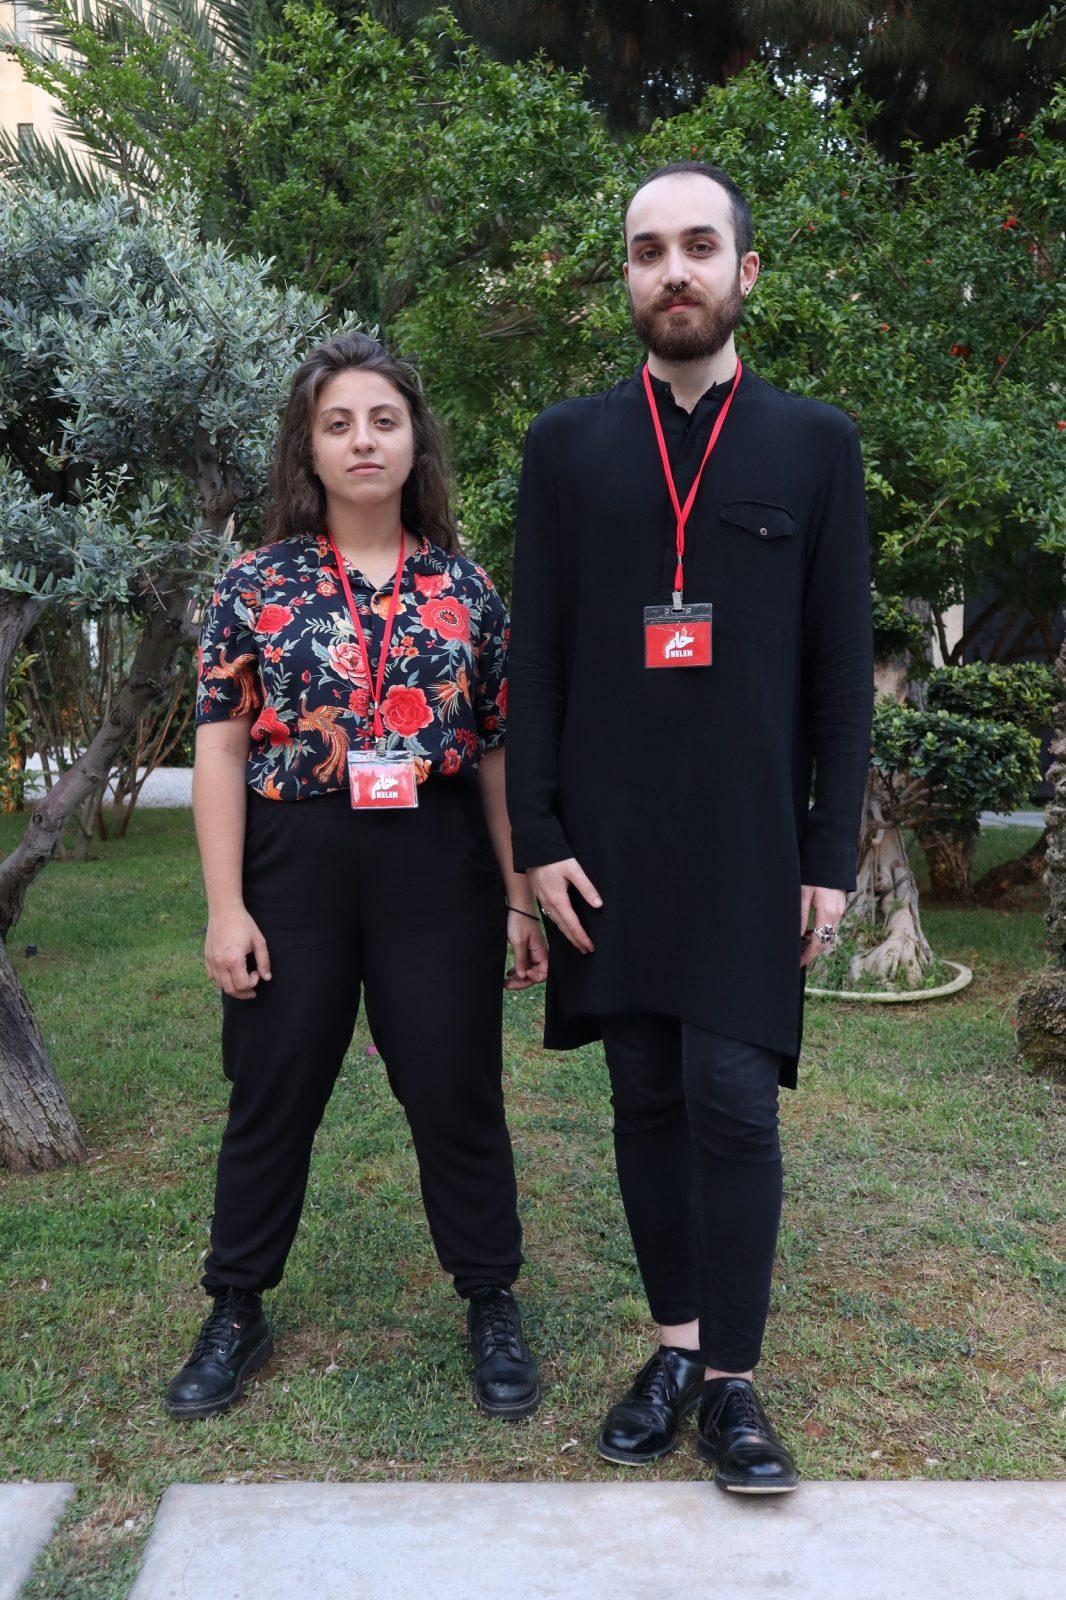 Hussein en Khoury